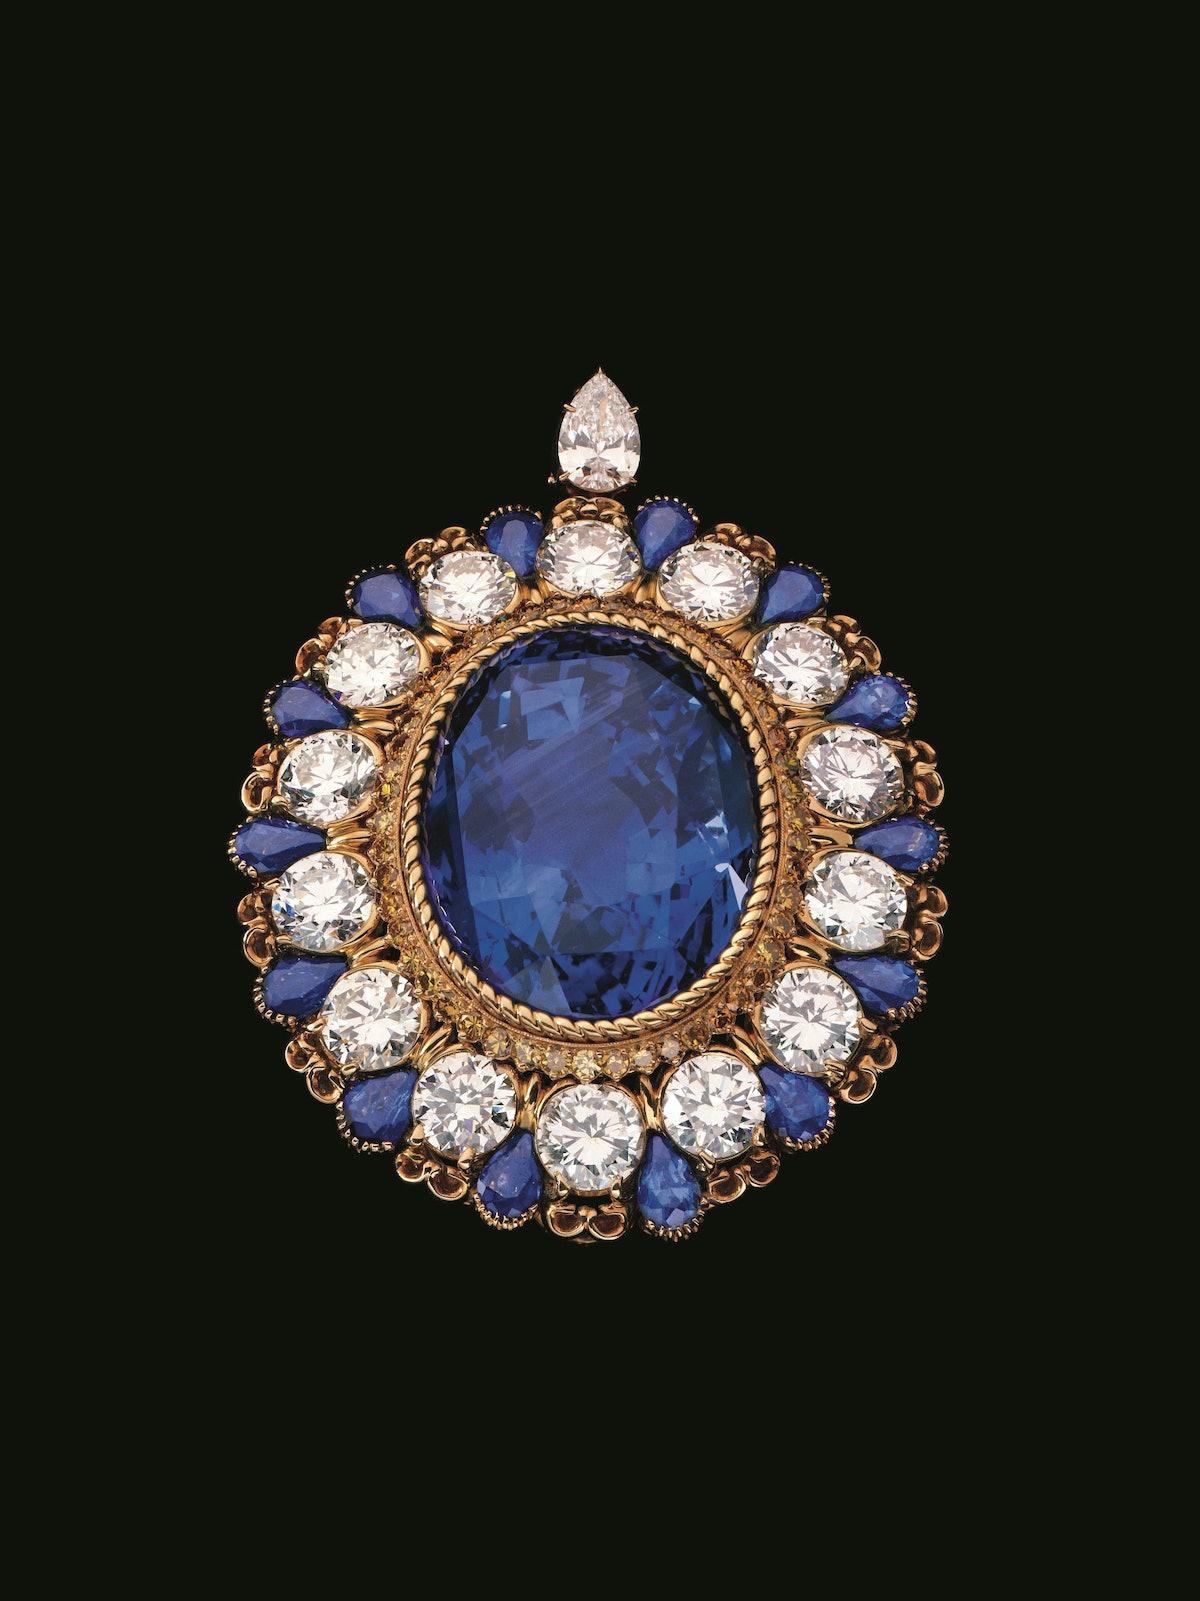 Sapphire and diamond brooch, 1980. Design by Alexandre Reza. Courtesy of Alexandre Reza.